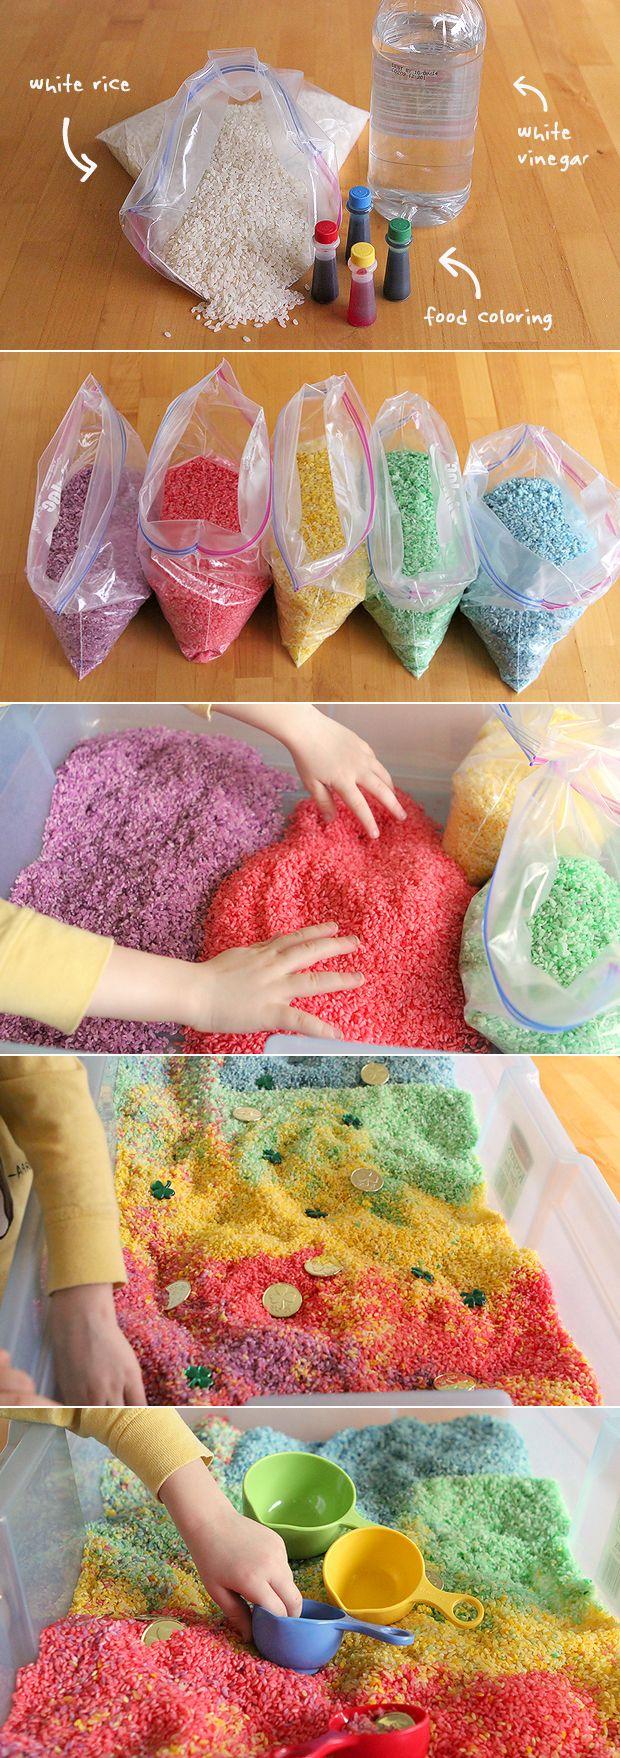 Diy Rainbow Sensory Box Taste The Pinterest Bak Mandi Bayi How To Make Rice For Arts Crafts And Play Recipe